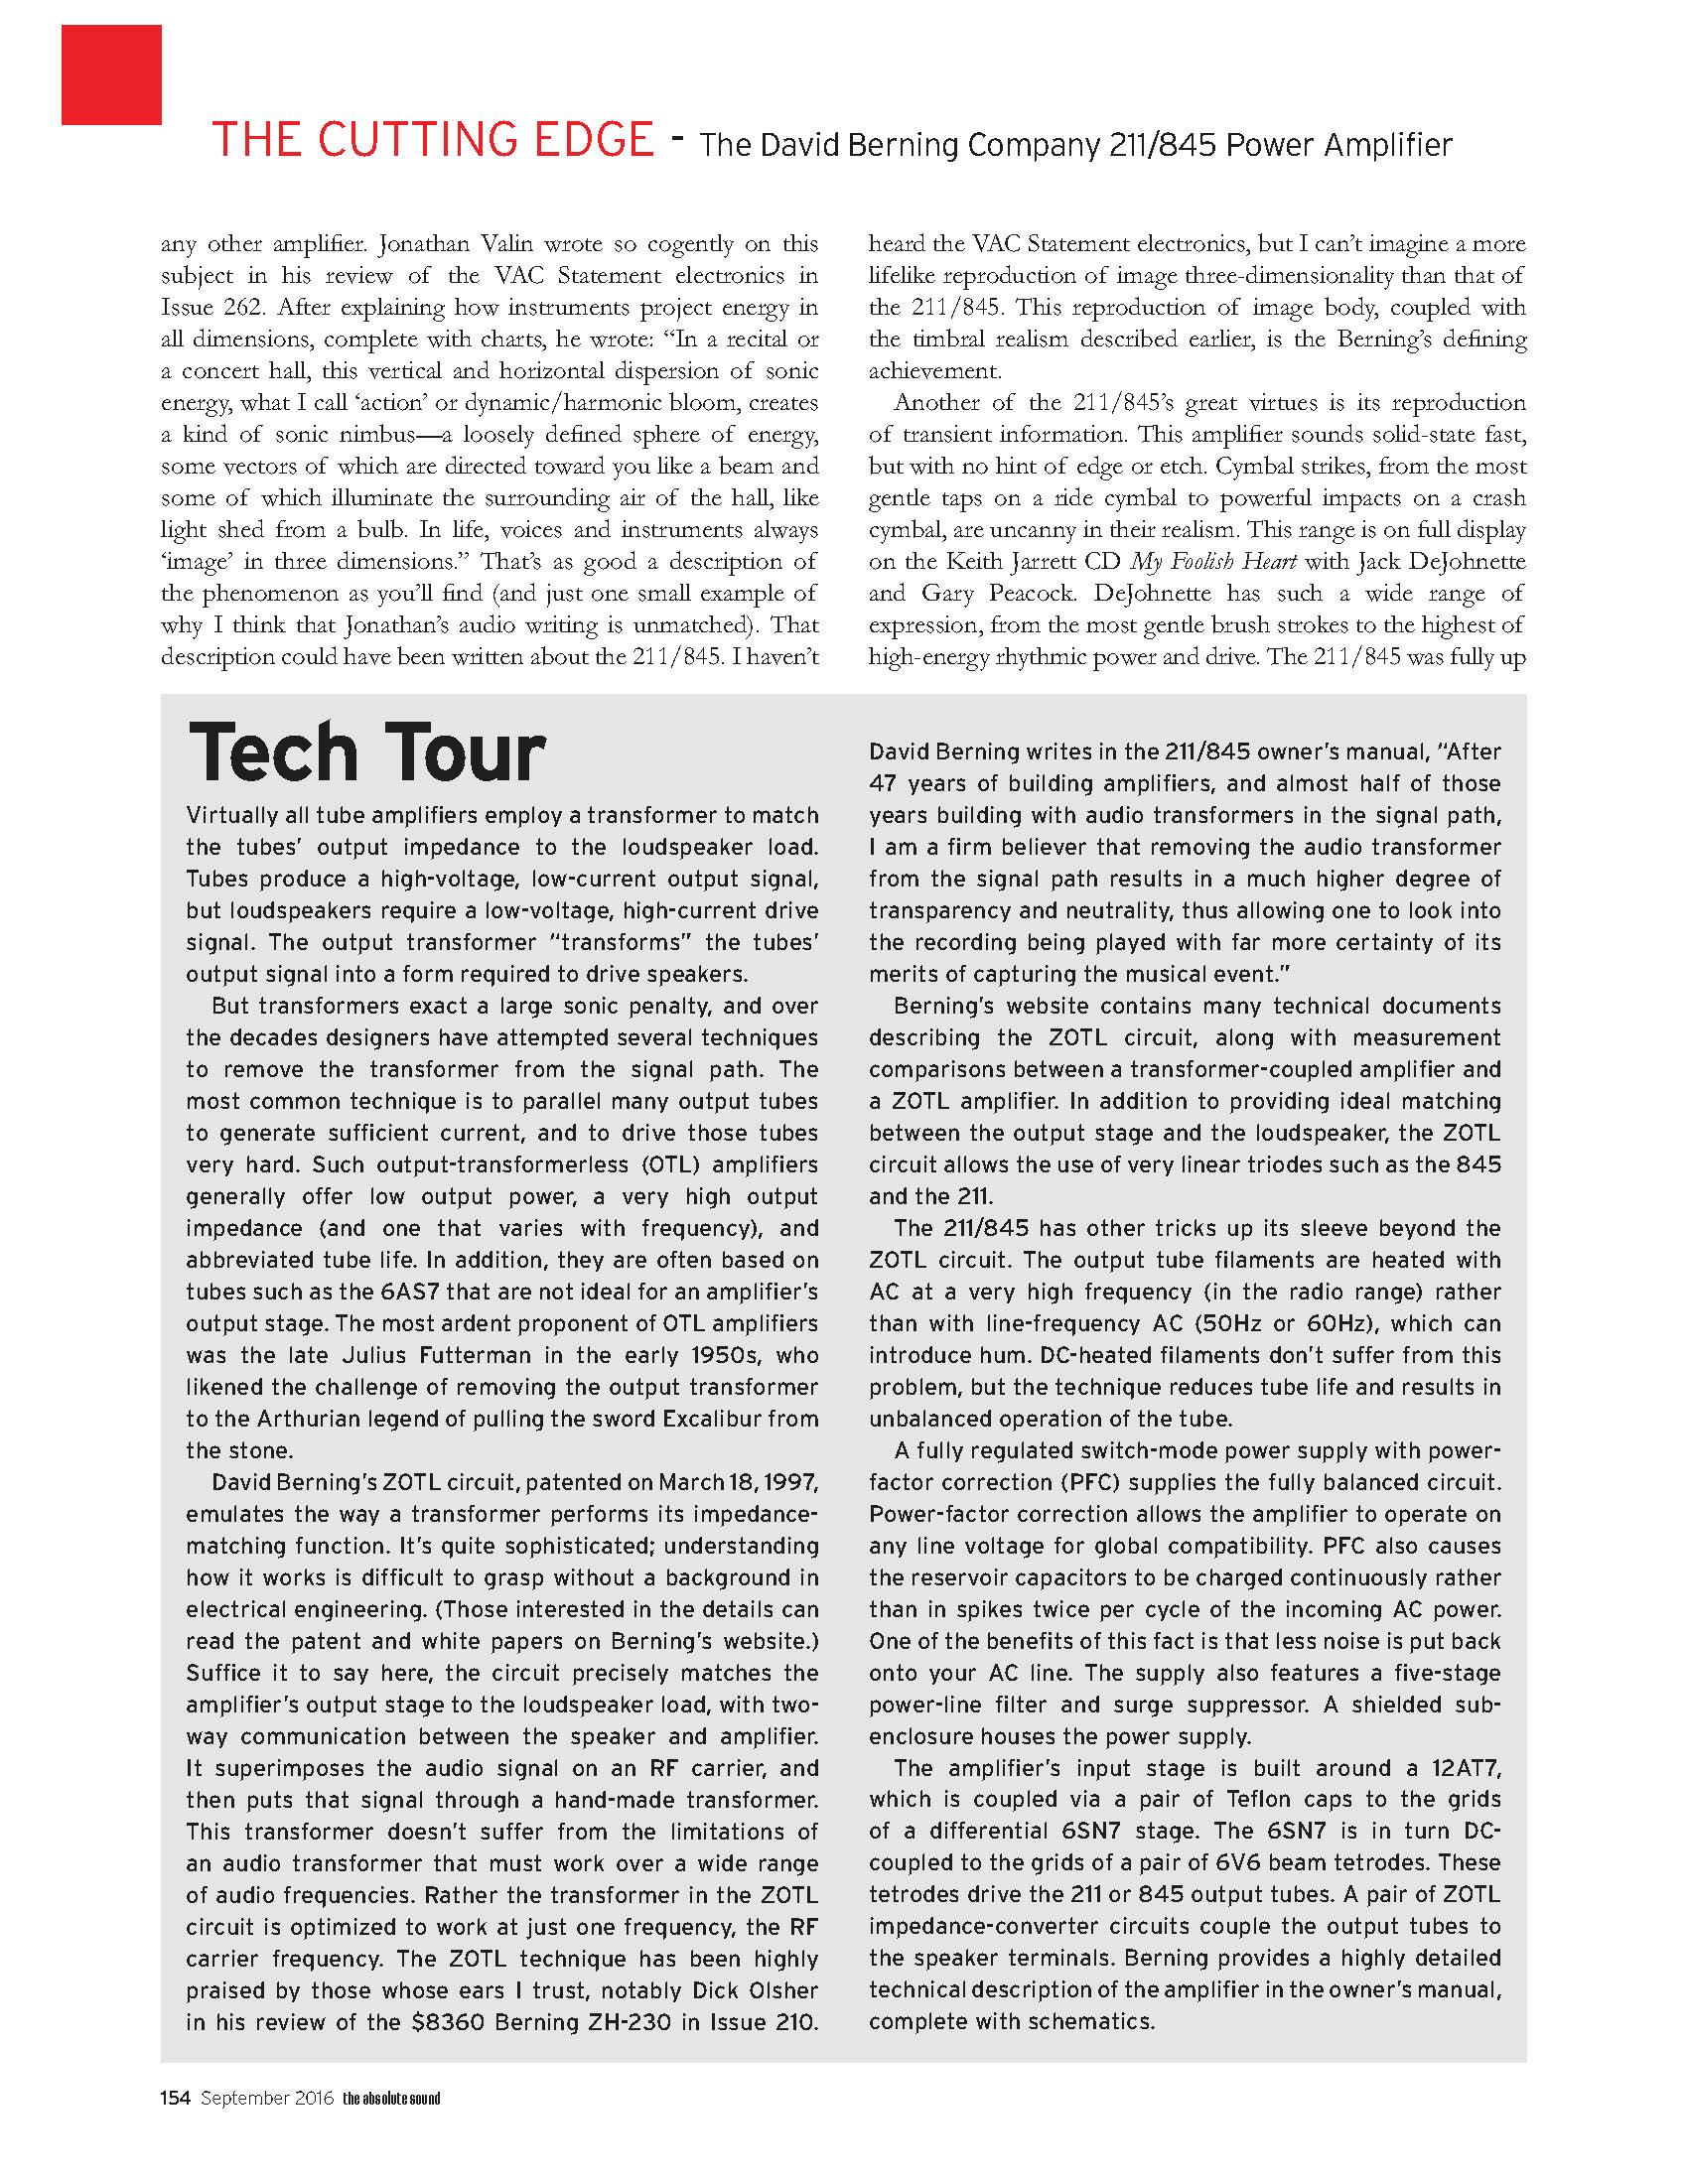 cutting-edge_Page_4.jpg